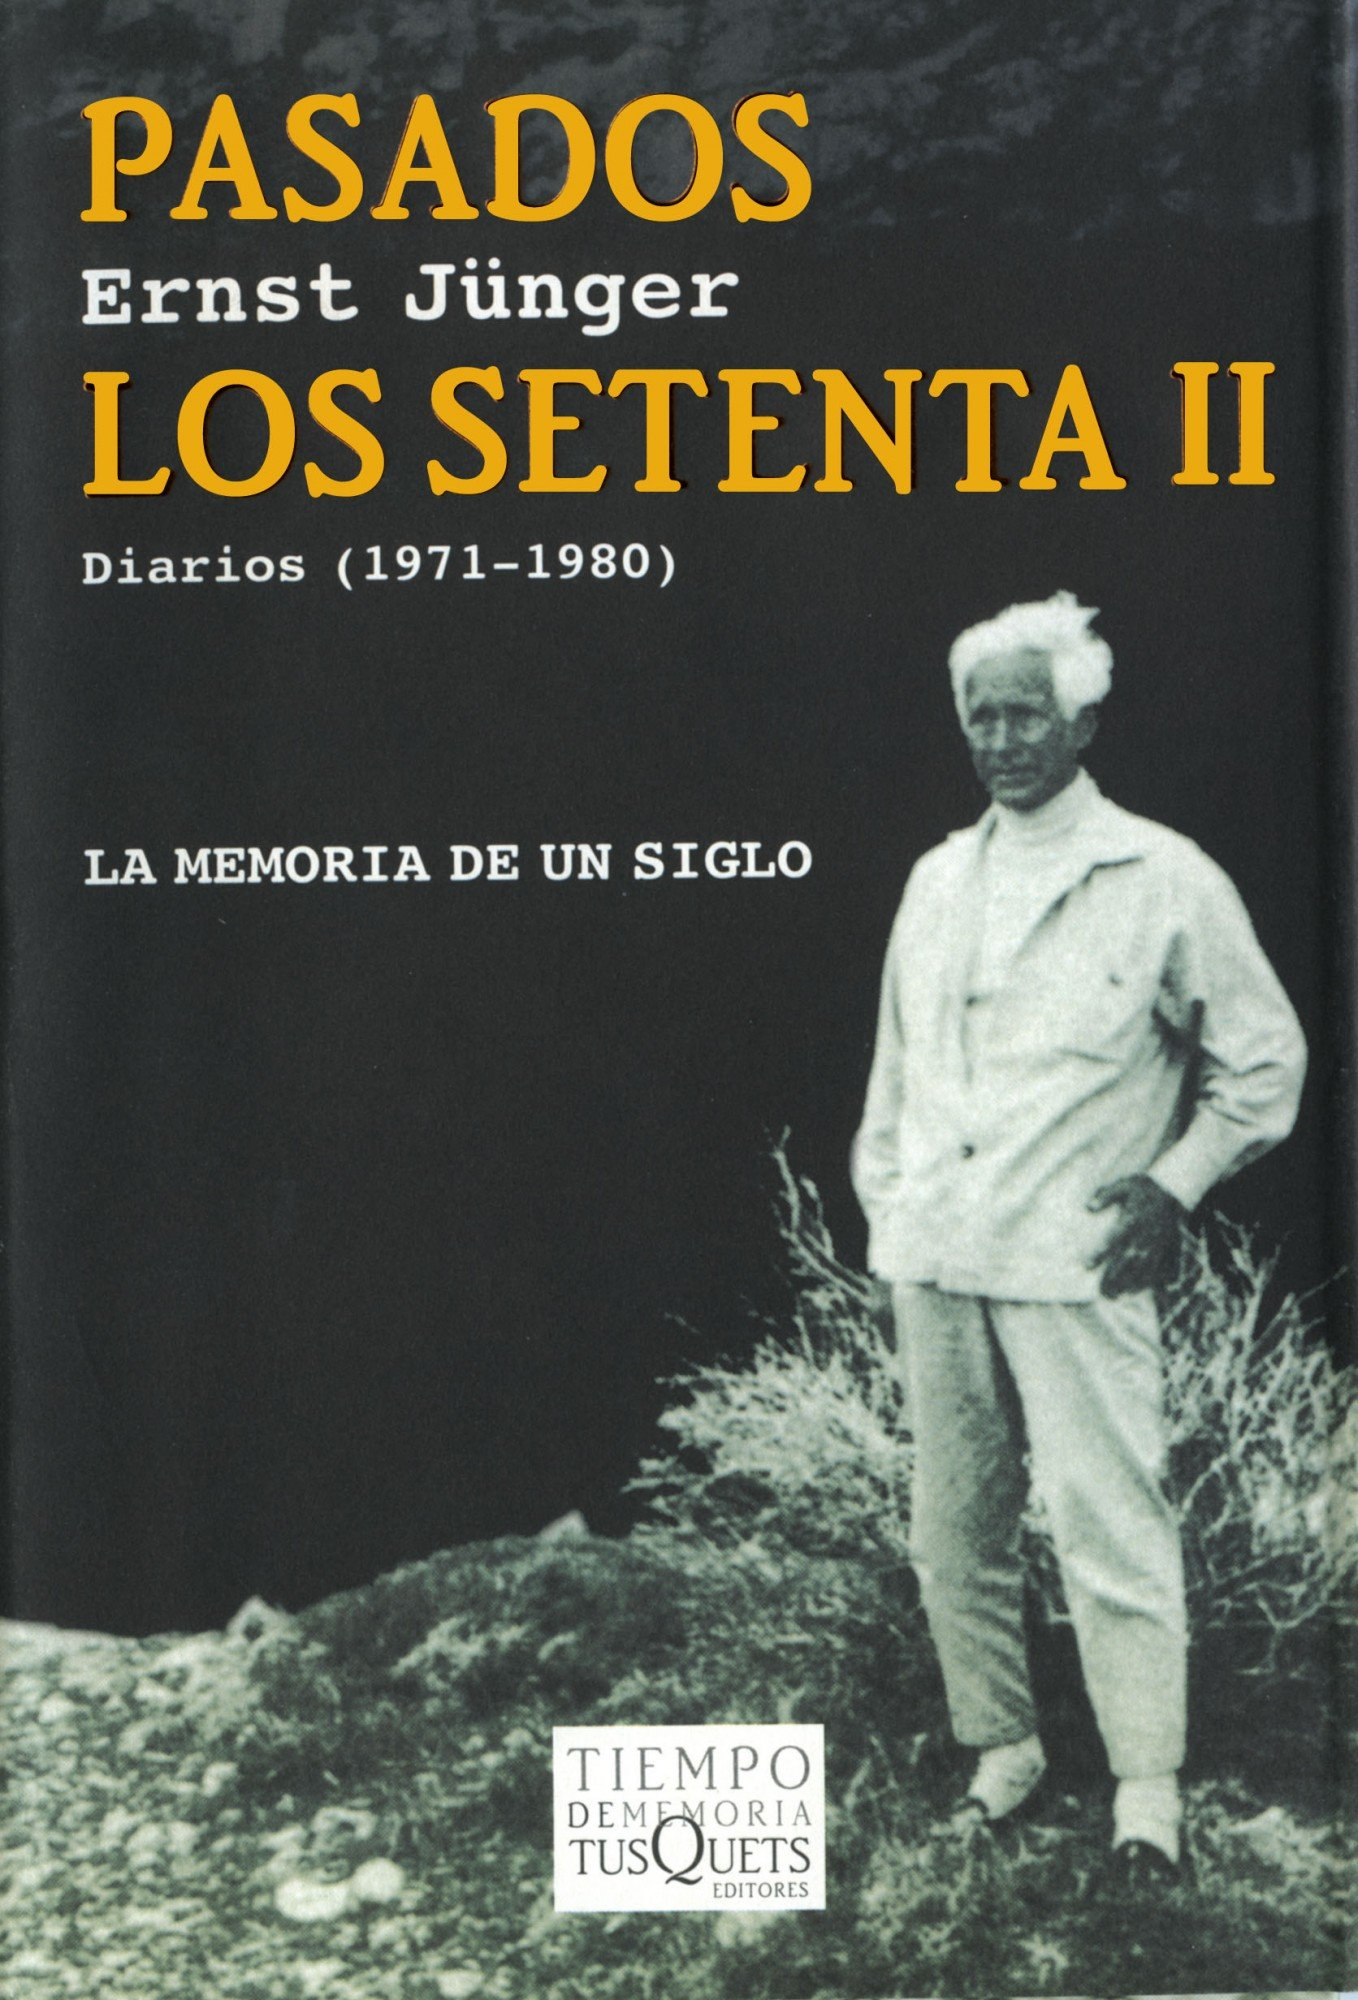 Pasados los setenta II. Diarios (Spanish Edition): Ernst Jünger: 9788483104828: Amazon.com: Books